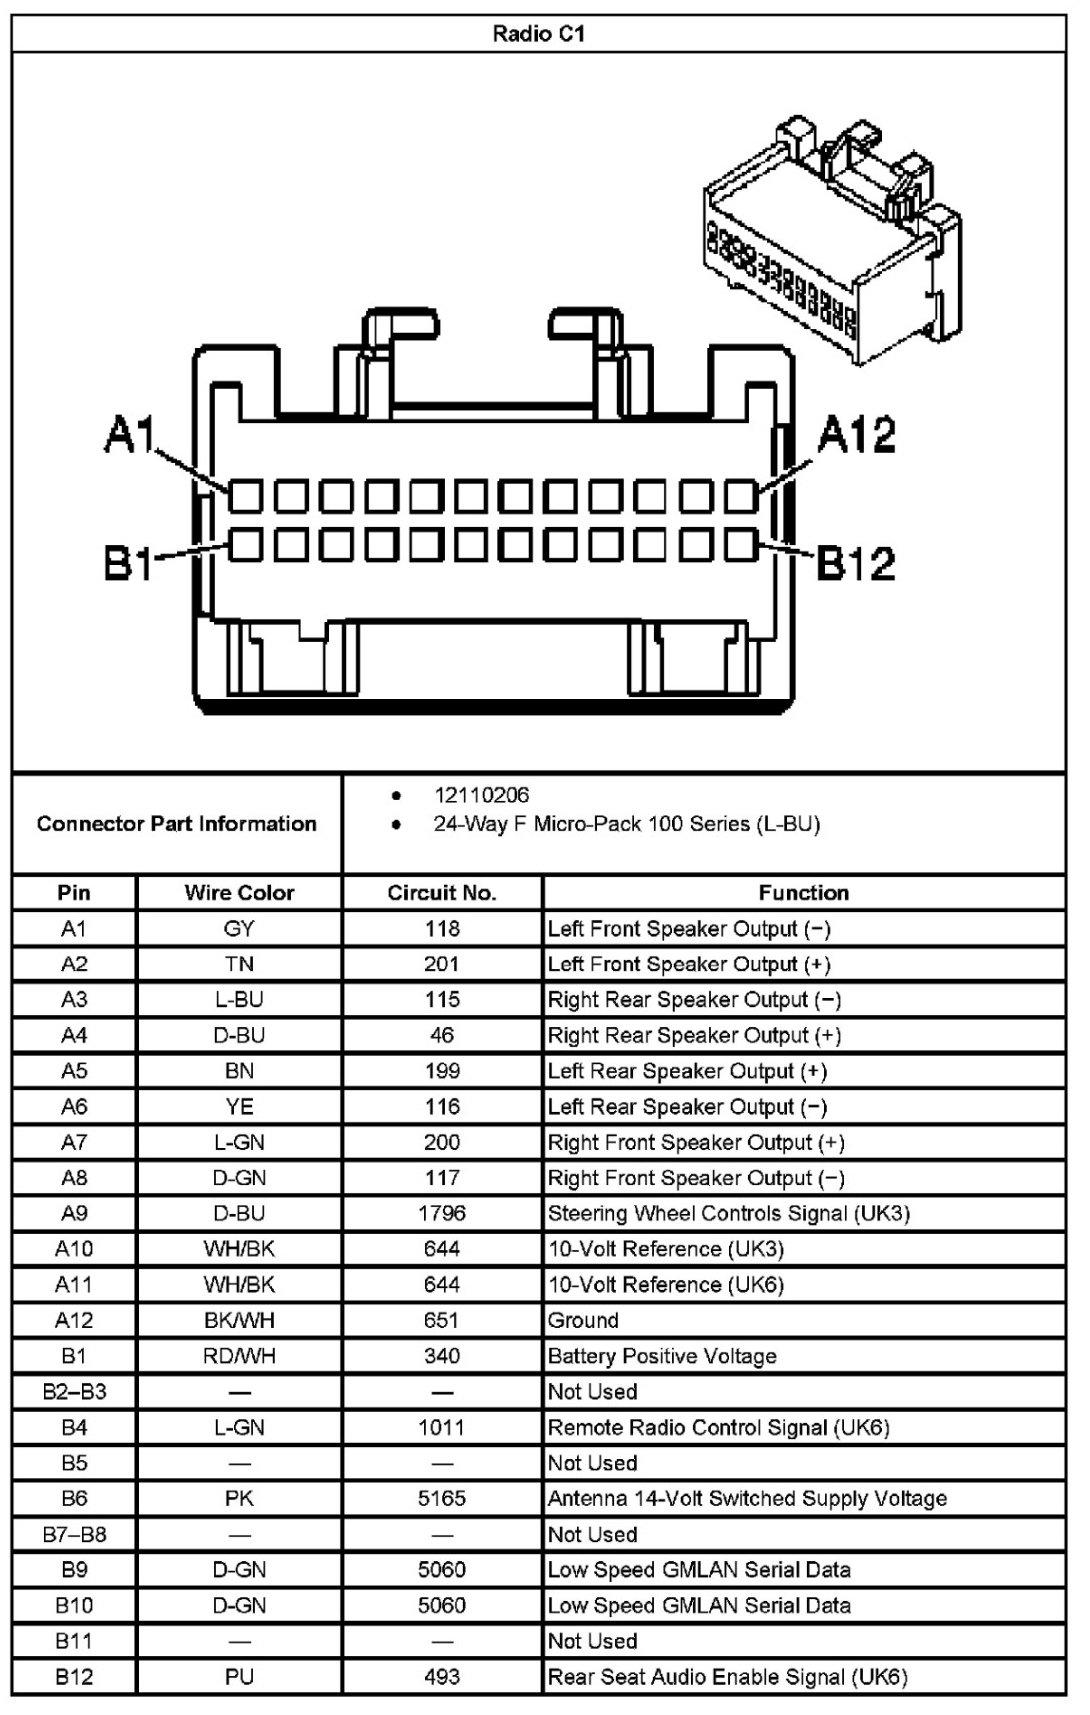 2006 Chevy Malibu Radio Factory Din Wiring Diagram